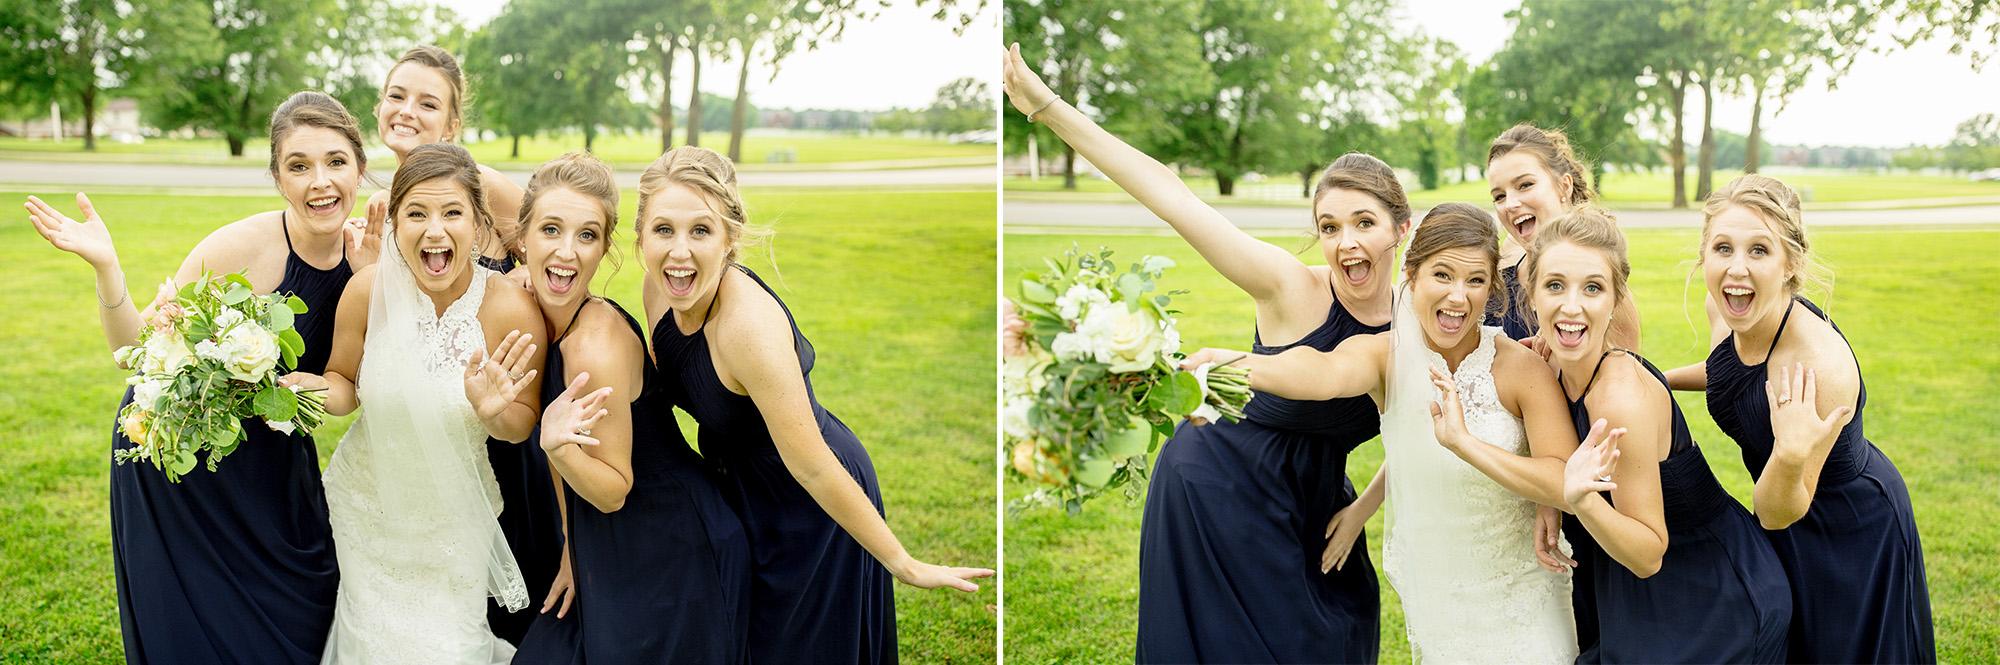 Seriously_Sabrina_Photography_Lexington_Kentucky_Round_Barn_Red_Mile_Stable_of_Memories_Wedding_Hart_87.jpg